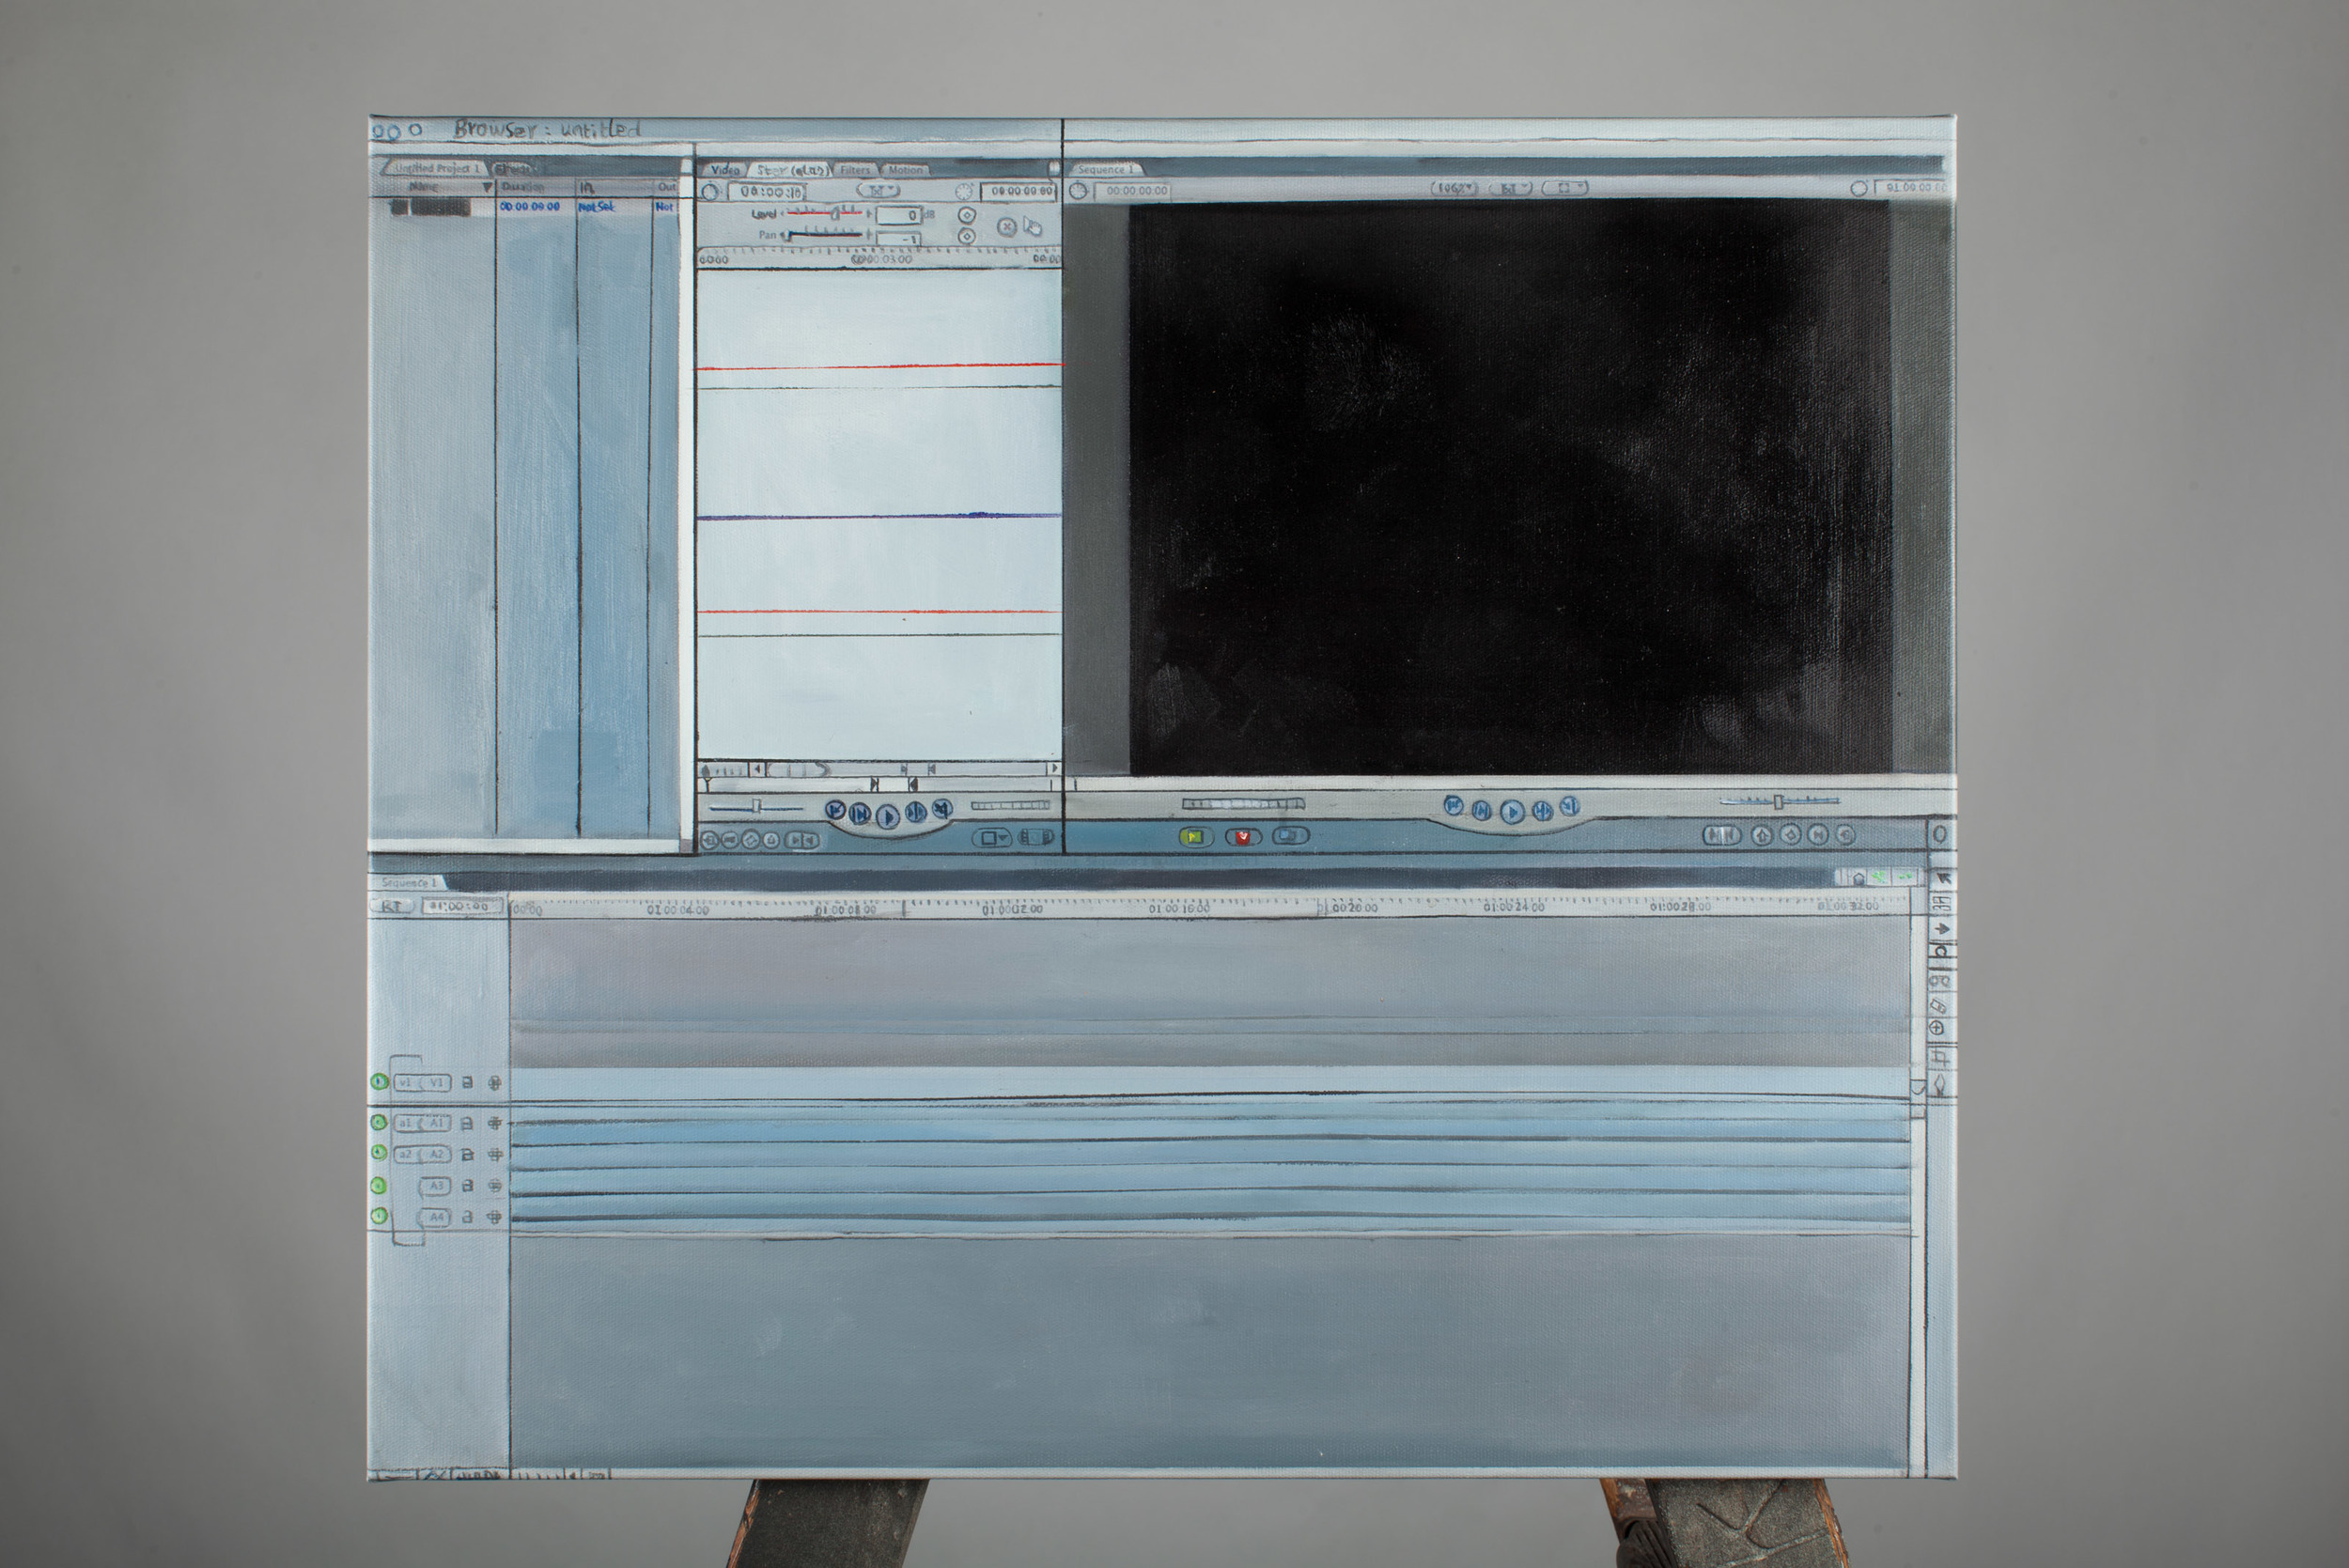 Untitled Final Cut Pro Project